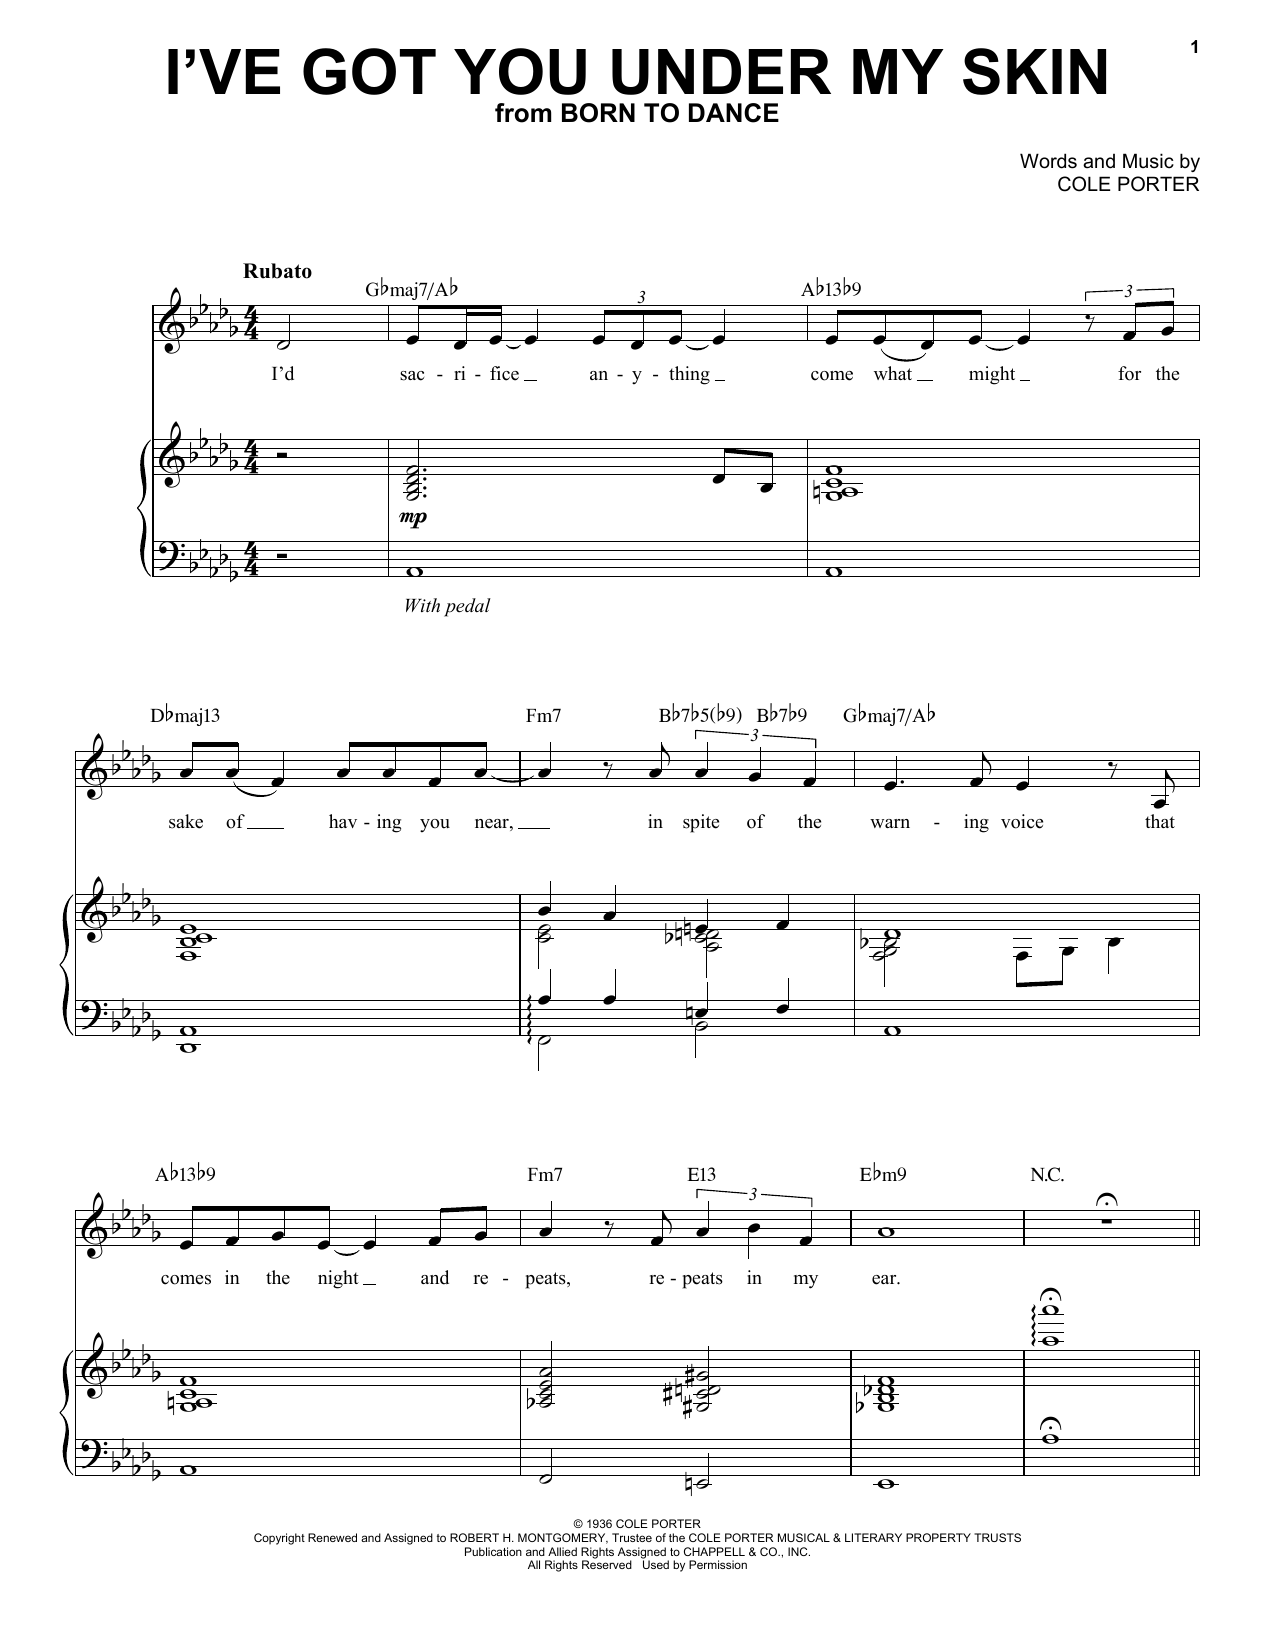 Landau Eugene Murphy, Jr. I've Got You Under My Skin sheet music notes and chords. Download Printable PDF.